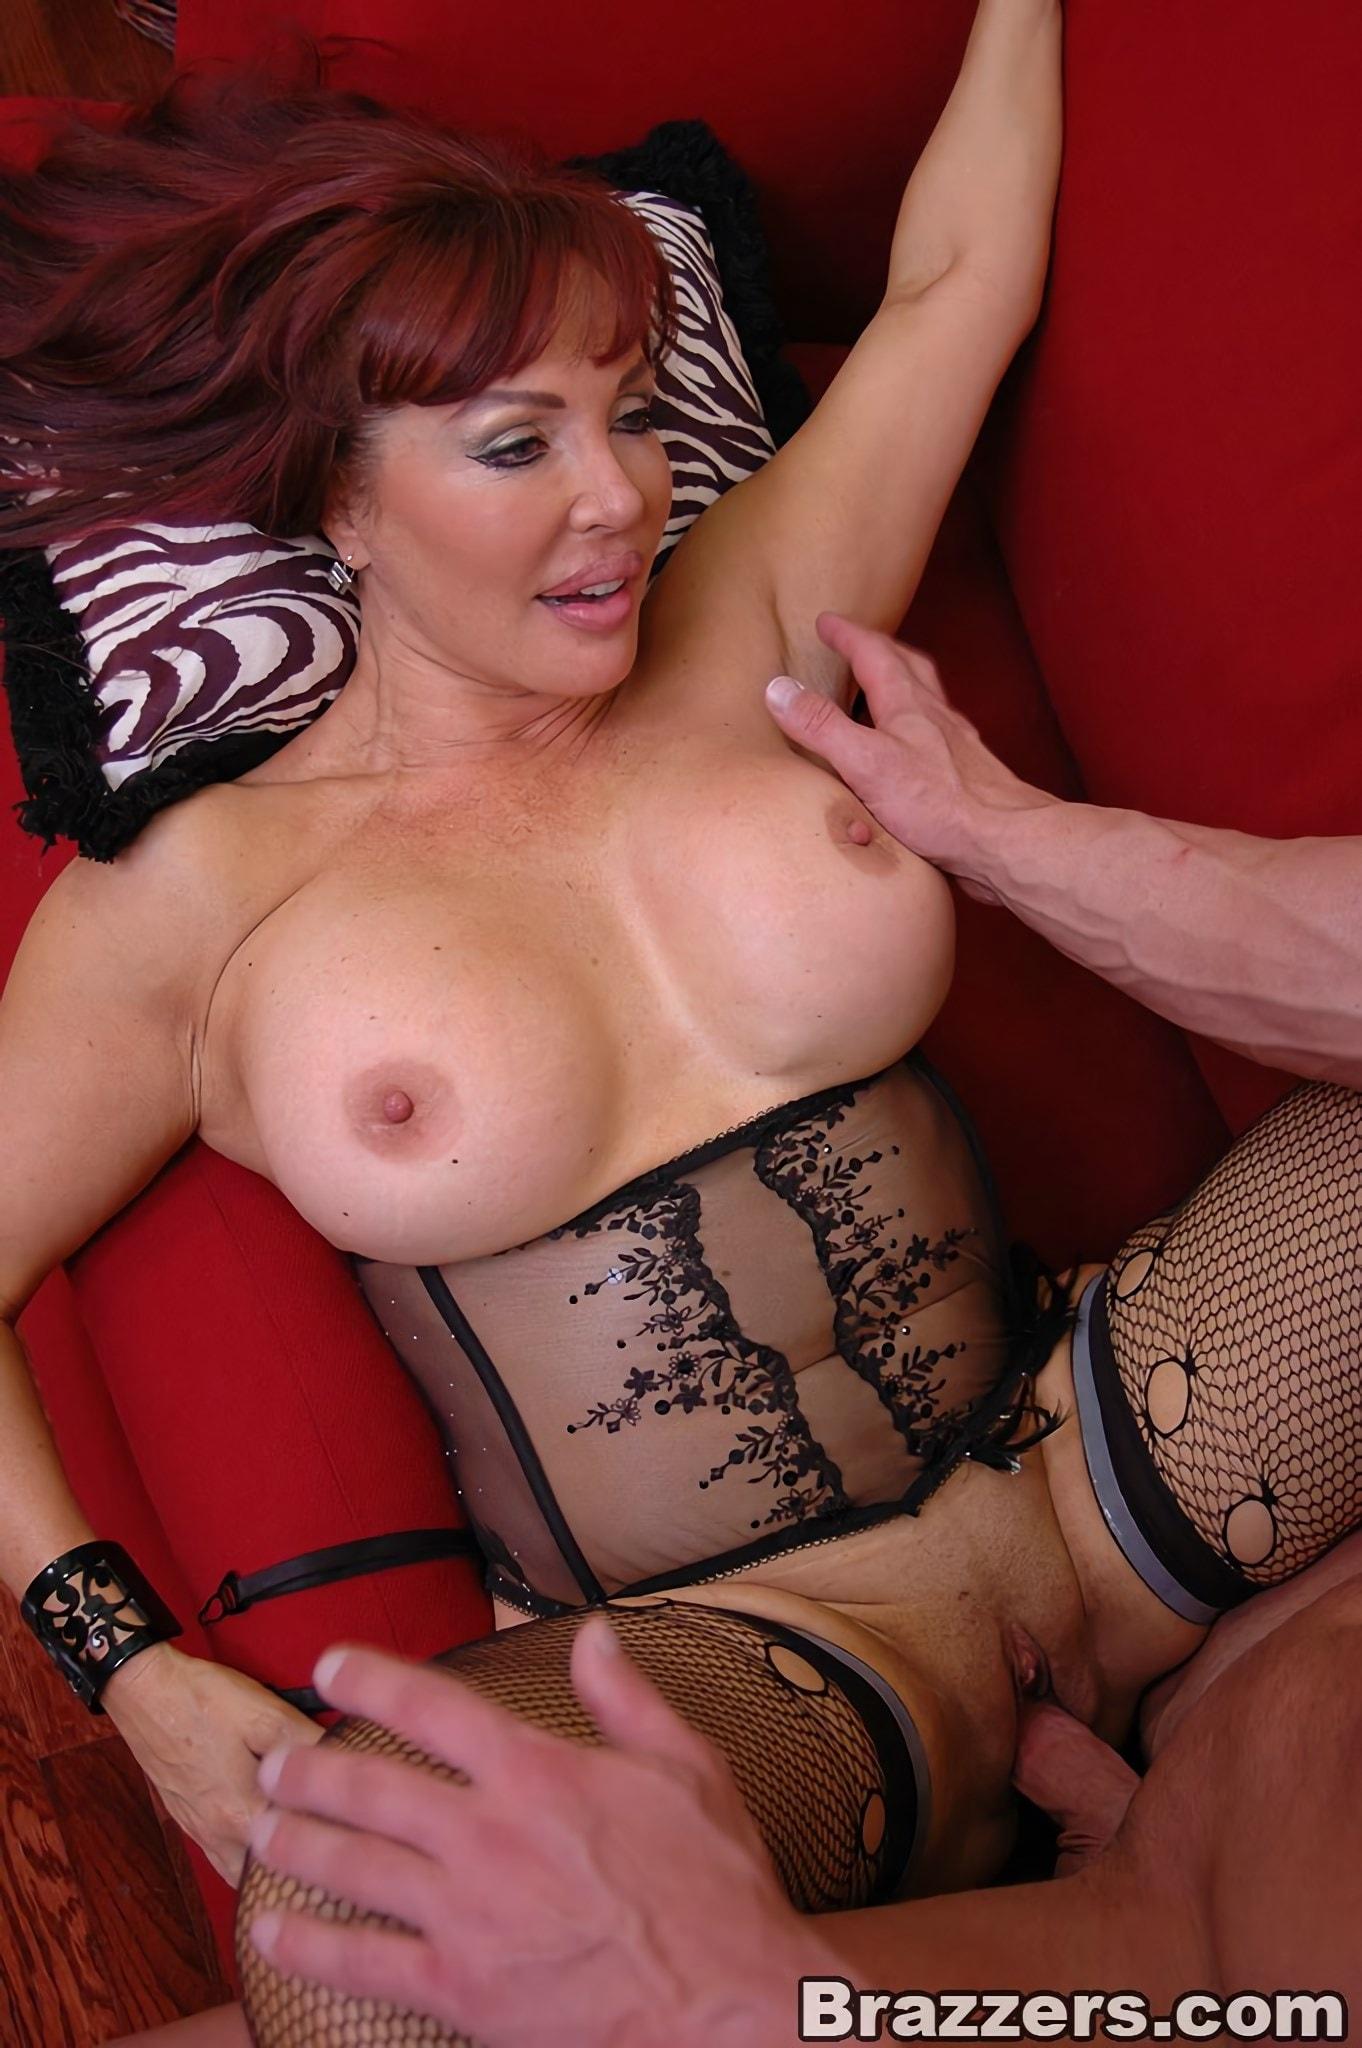 Brazzers 'Hot Busty Milf Nymph Vanessa' starring Sexy Vanessa (Photo 11)